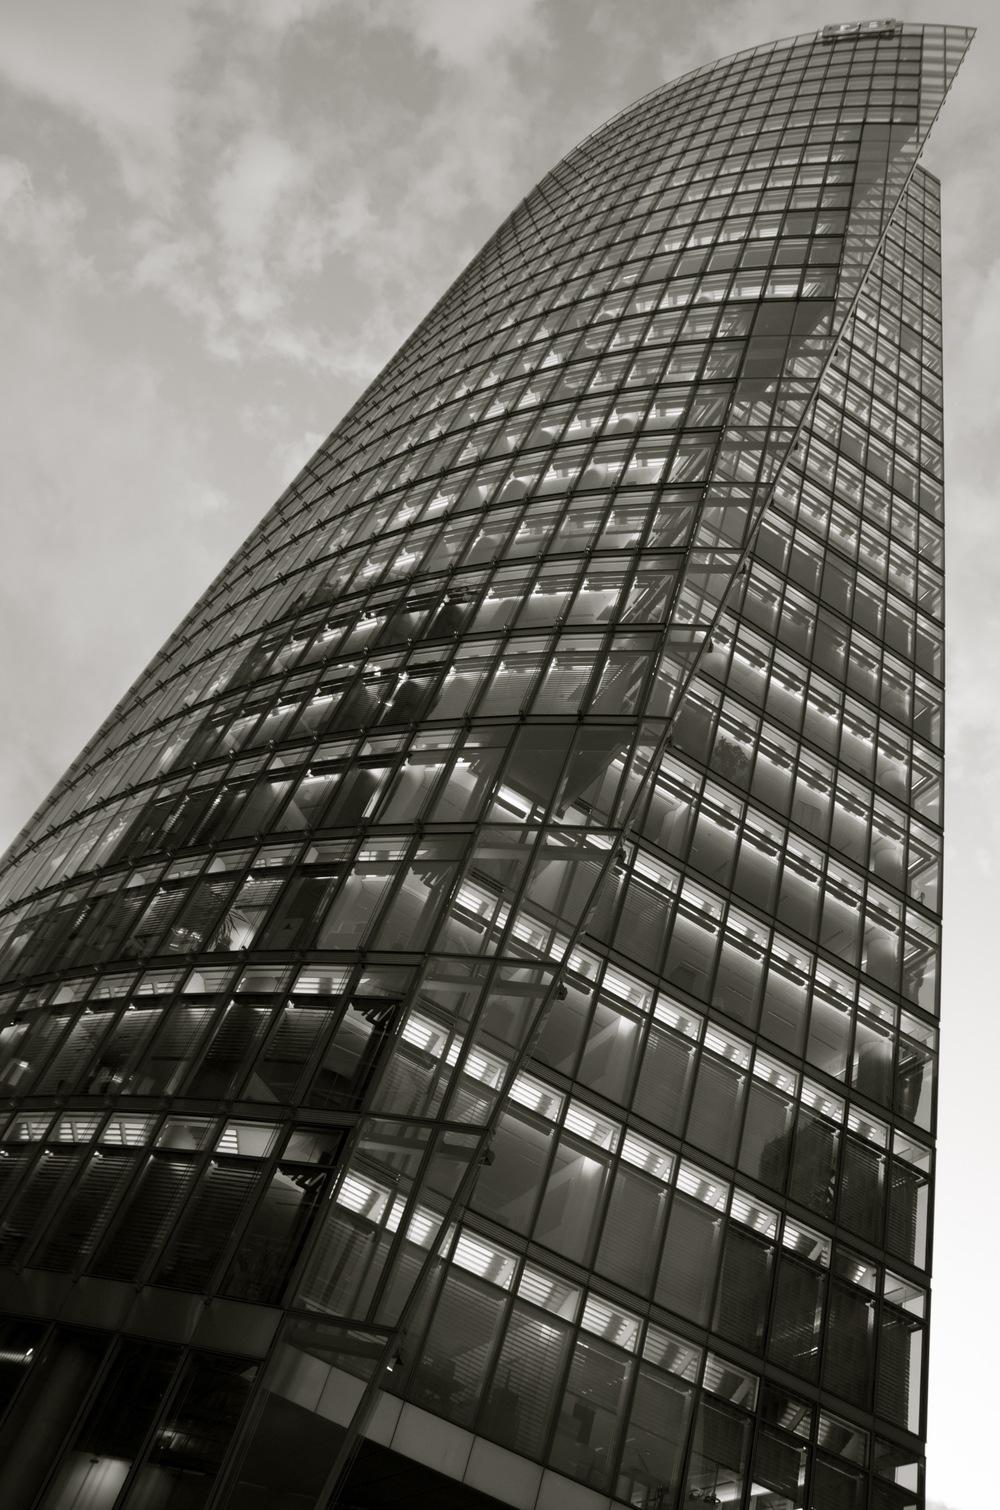 Bahntower, Sony Center, Potsdamerplatz, Berlin